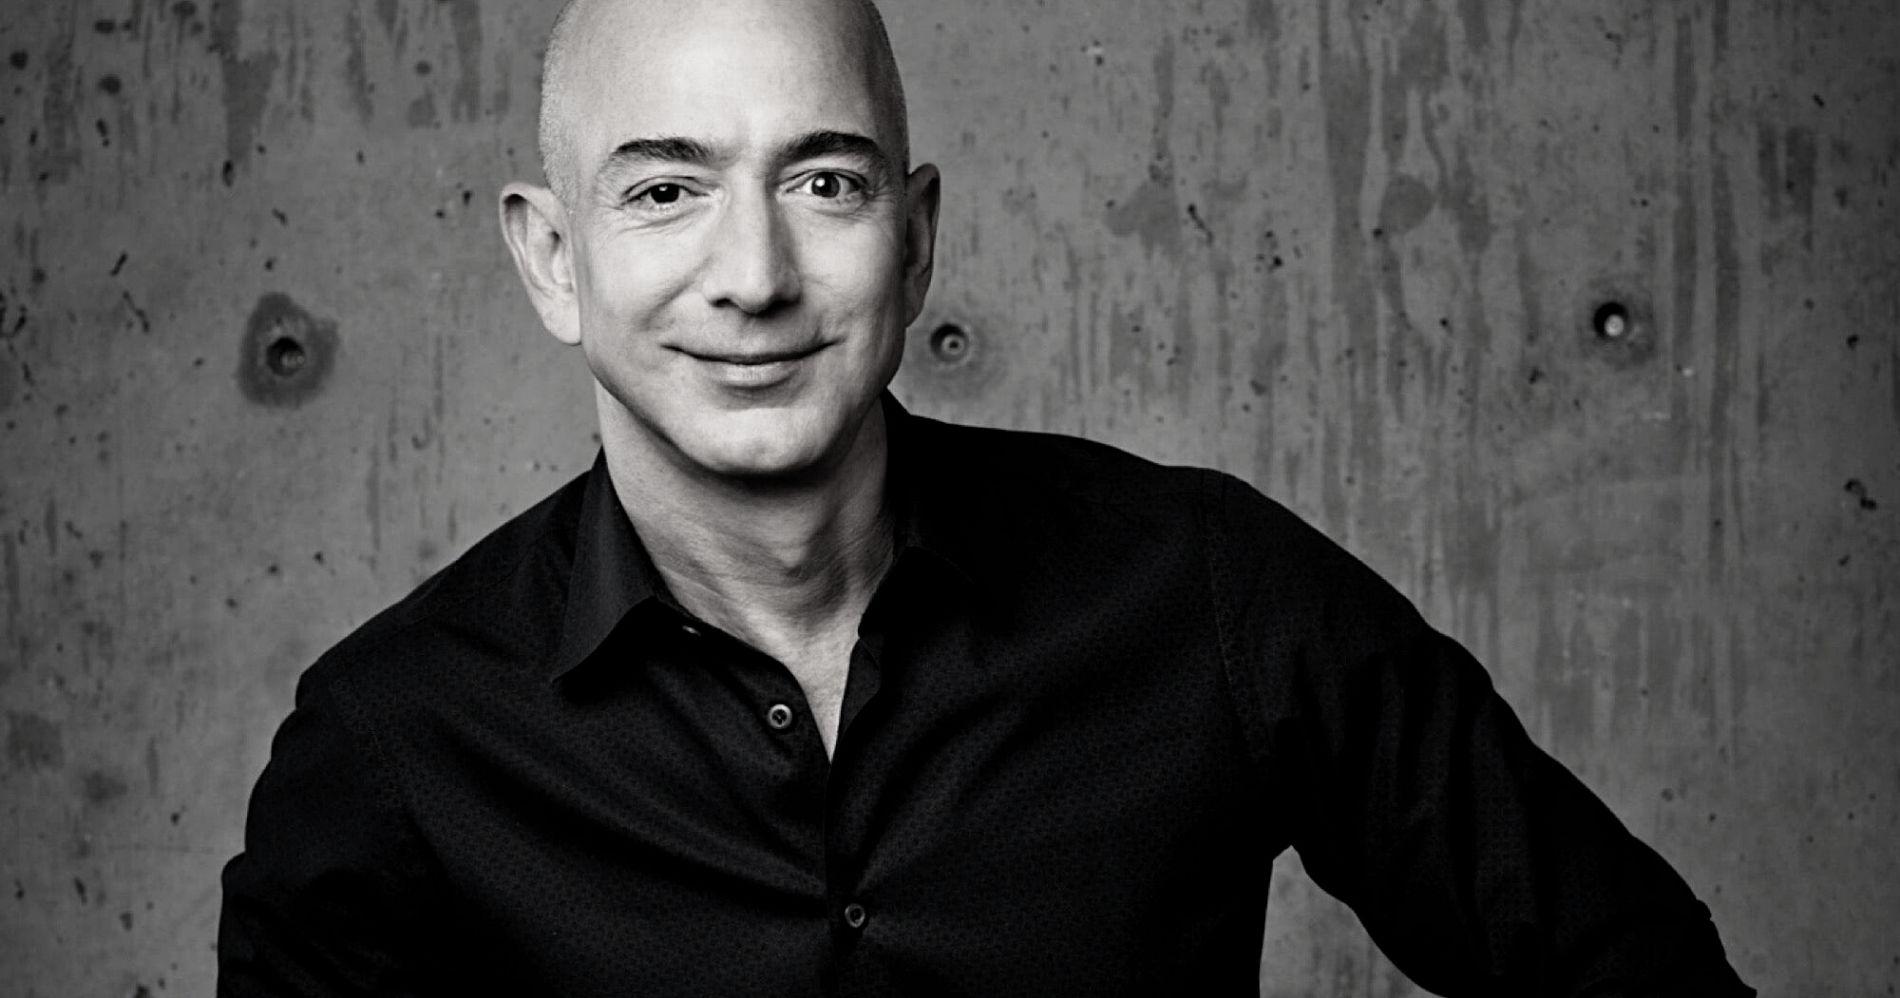 Fakta Menarik Jeff Bezos Illustration Web Bisnis Muda - Image: Flickr